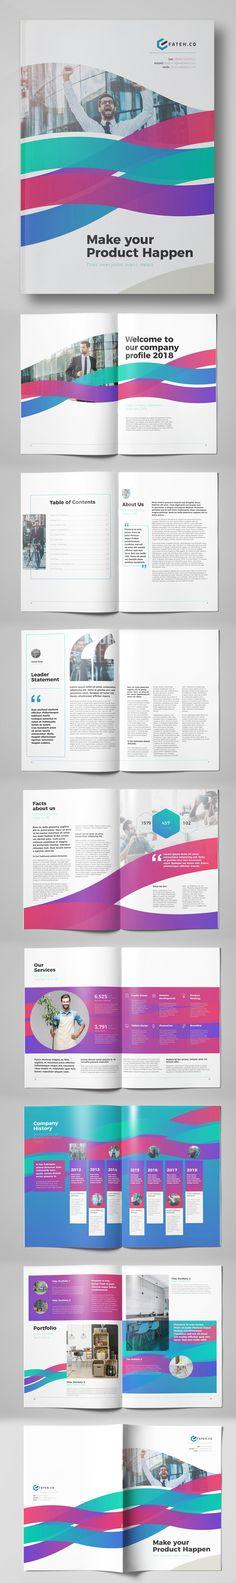 Creative Business Brochure Template (24 Pages) #brochuretemplate #catalogdesign #booklet #annualreport #printdesign #psdtemplate